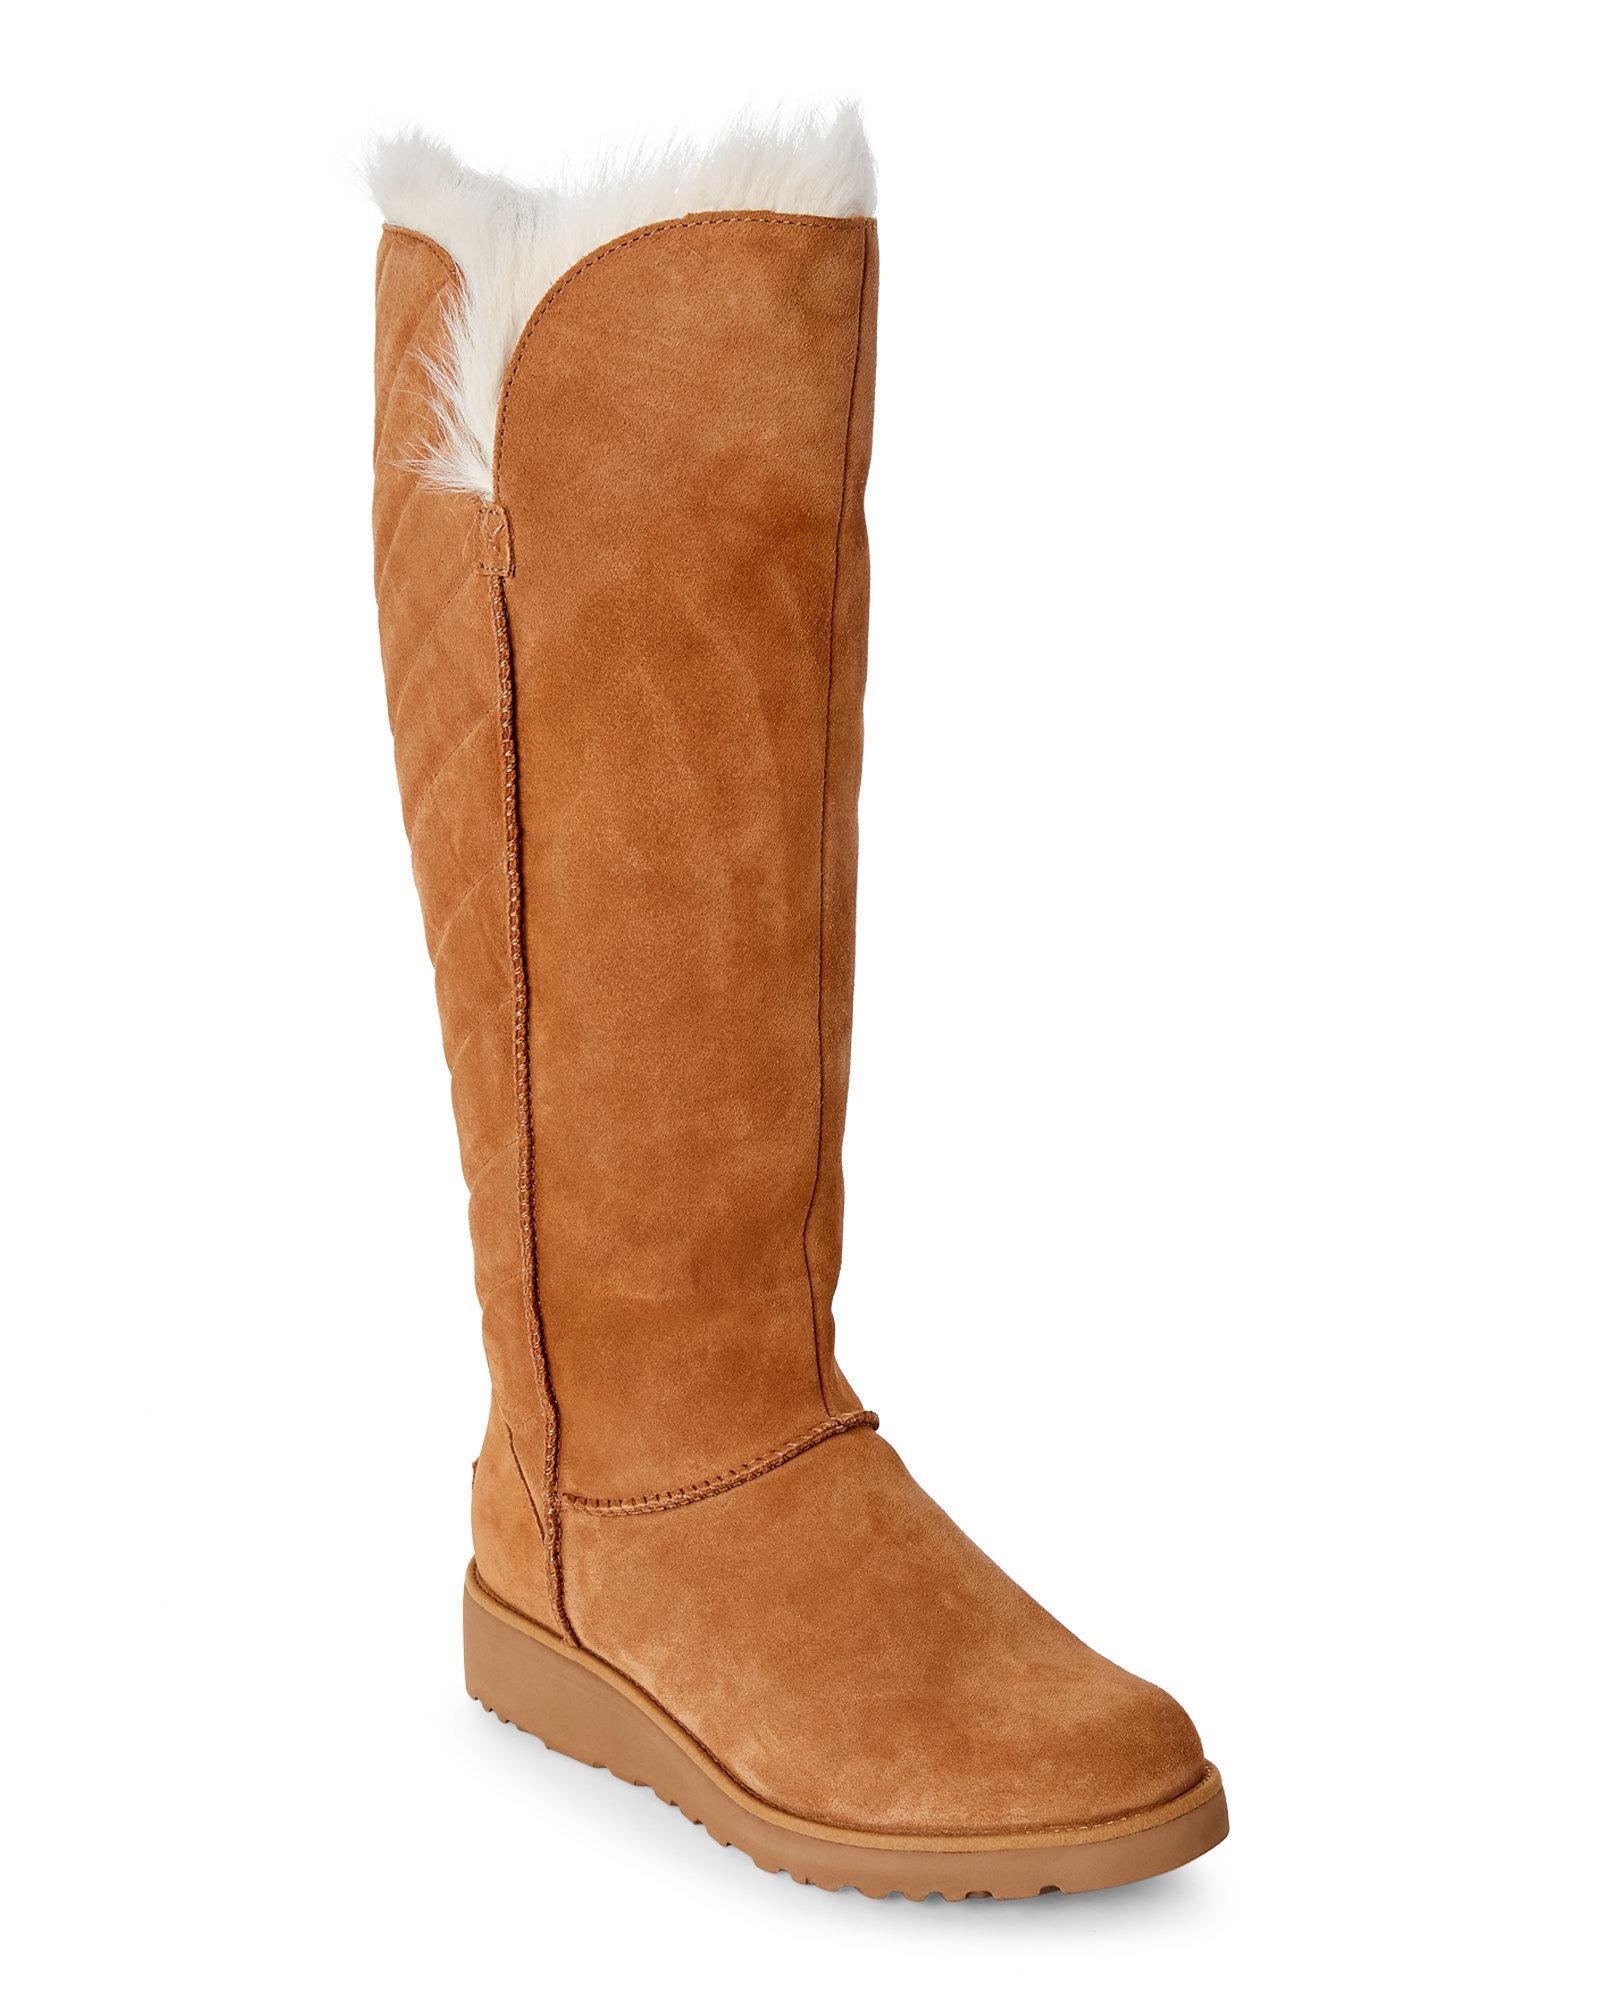 772c415ac9c Ugg Brown Chestnut Rosalind Tall Sheepskin Boots